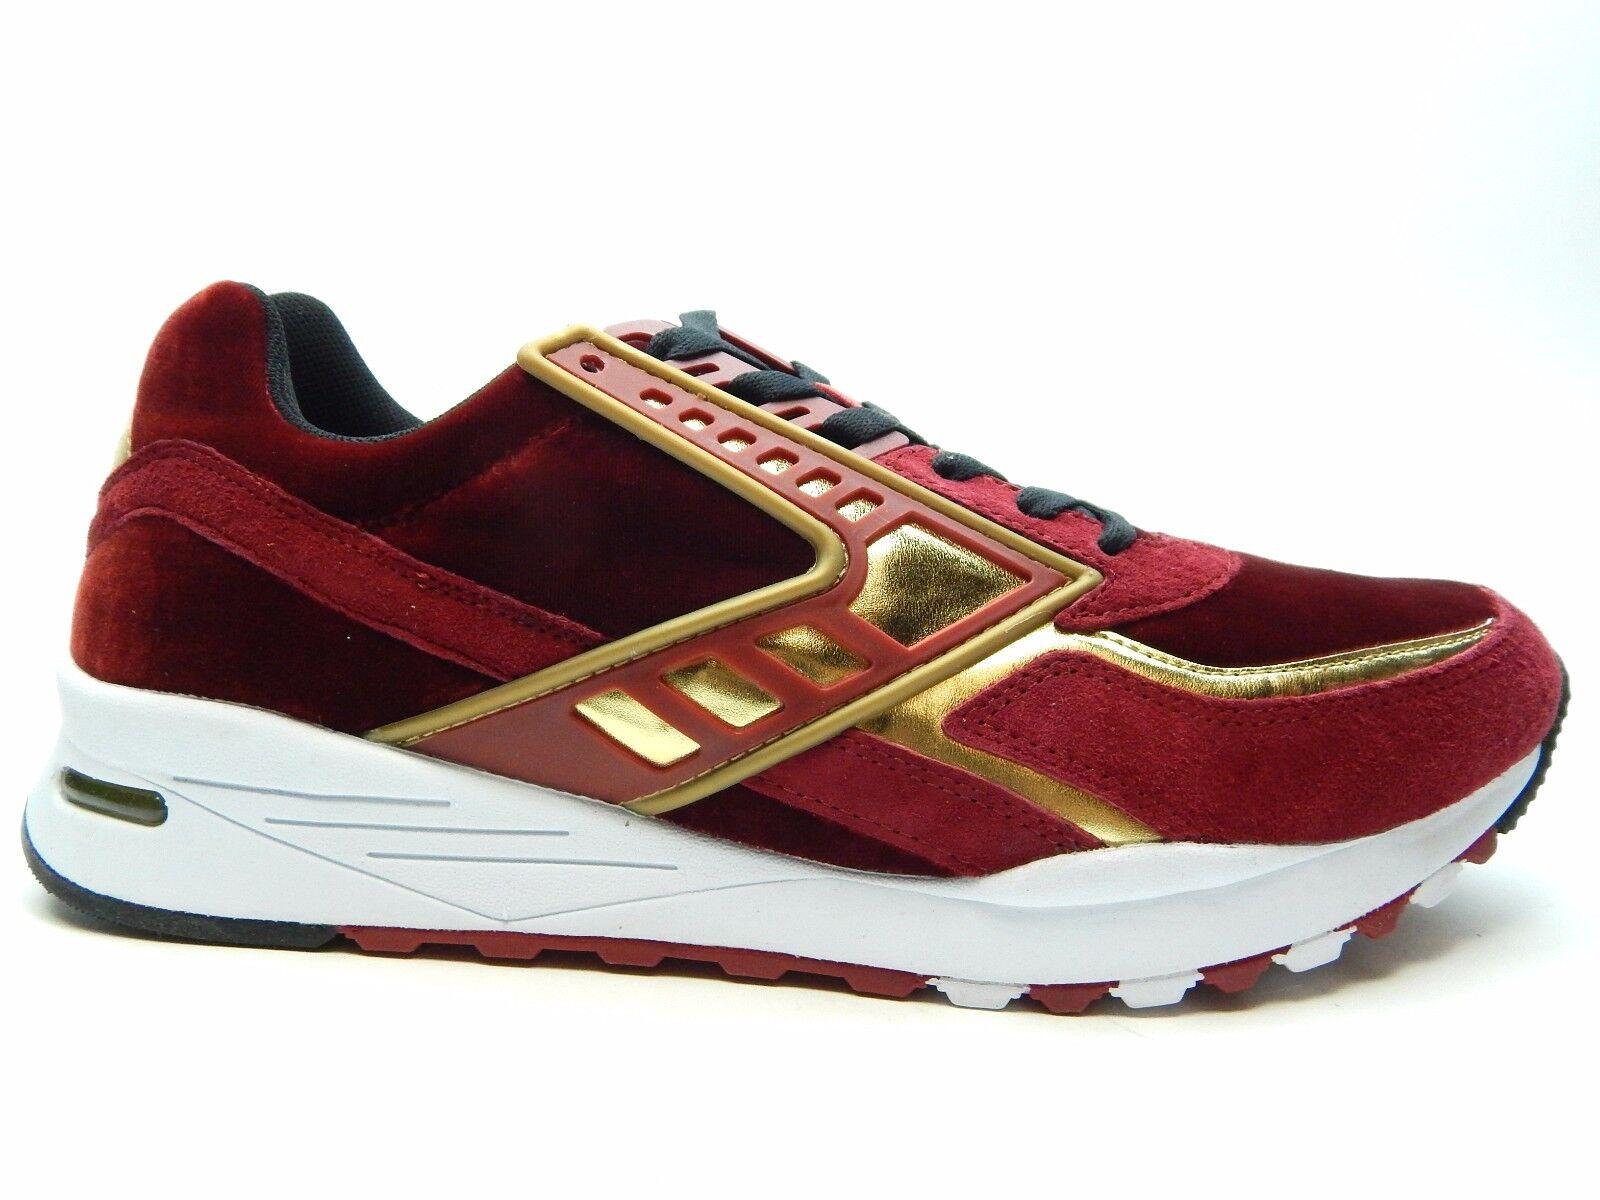 BROOKS para hombre REGENT Rojo Dahlia oro Cromo hombres zapatos talla 12